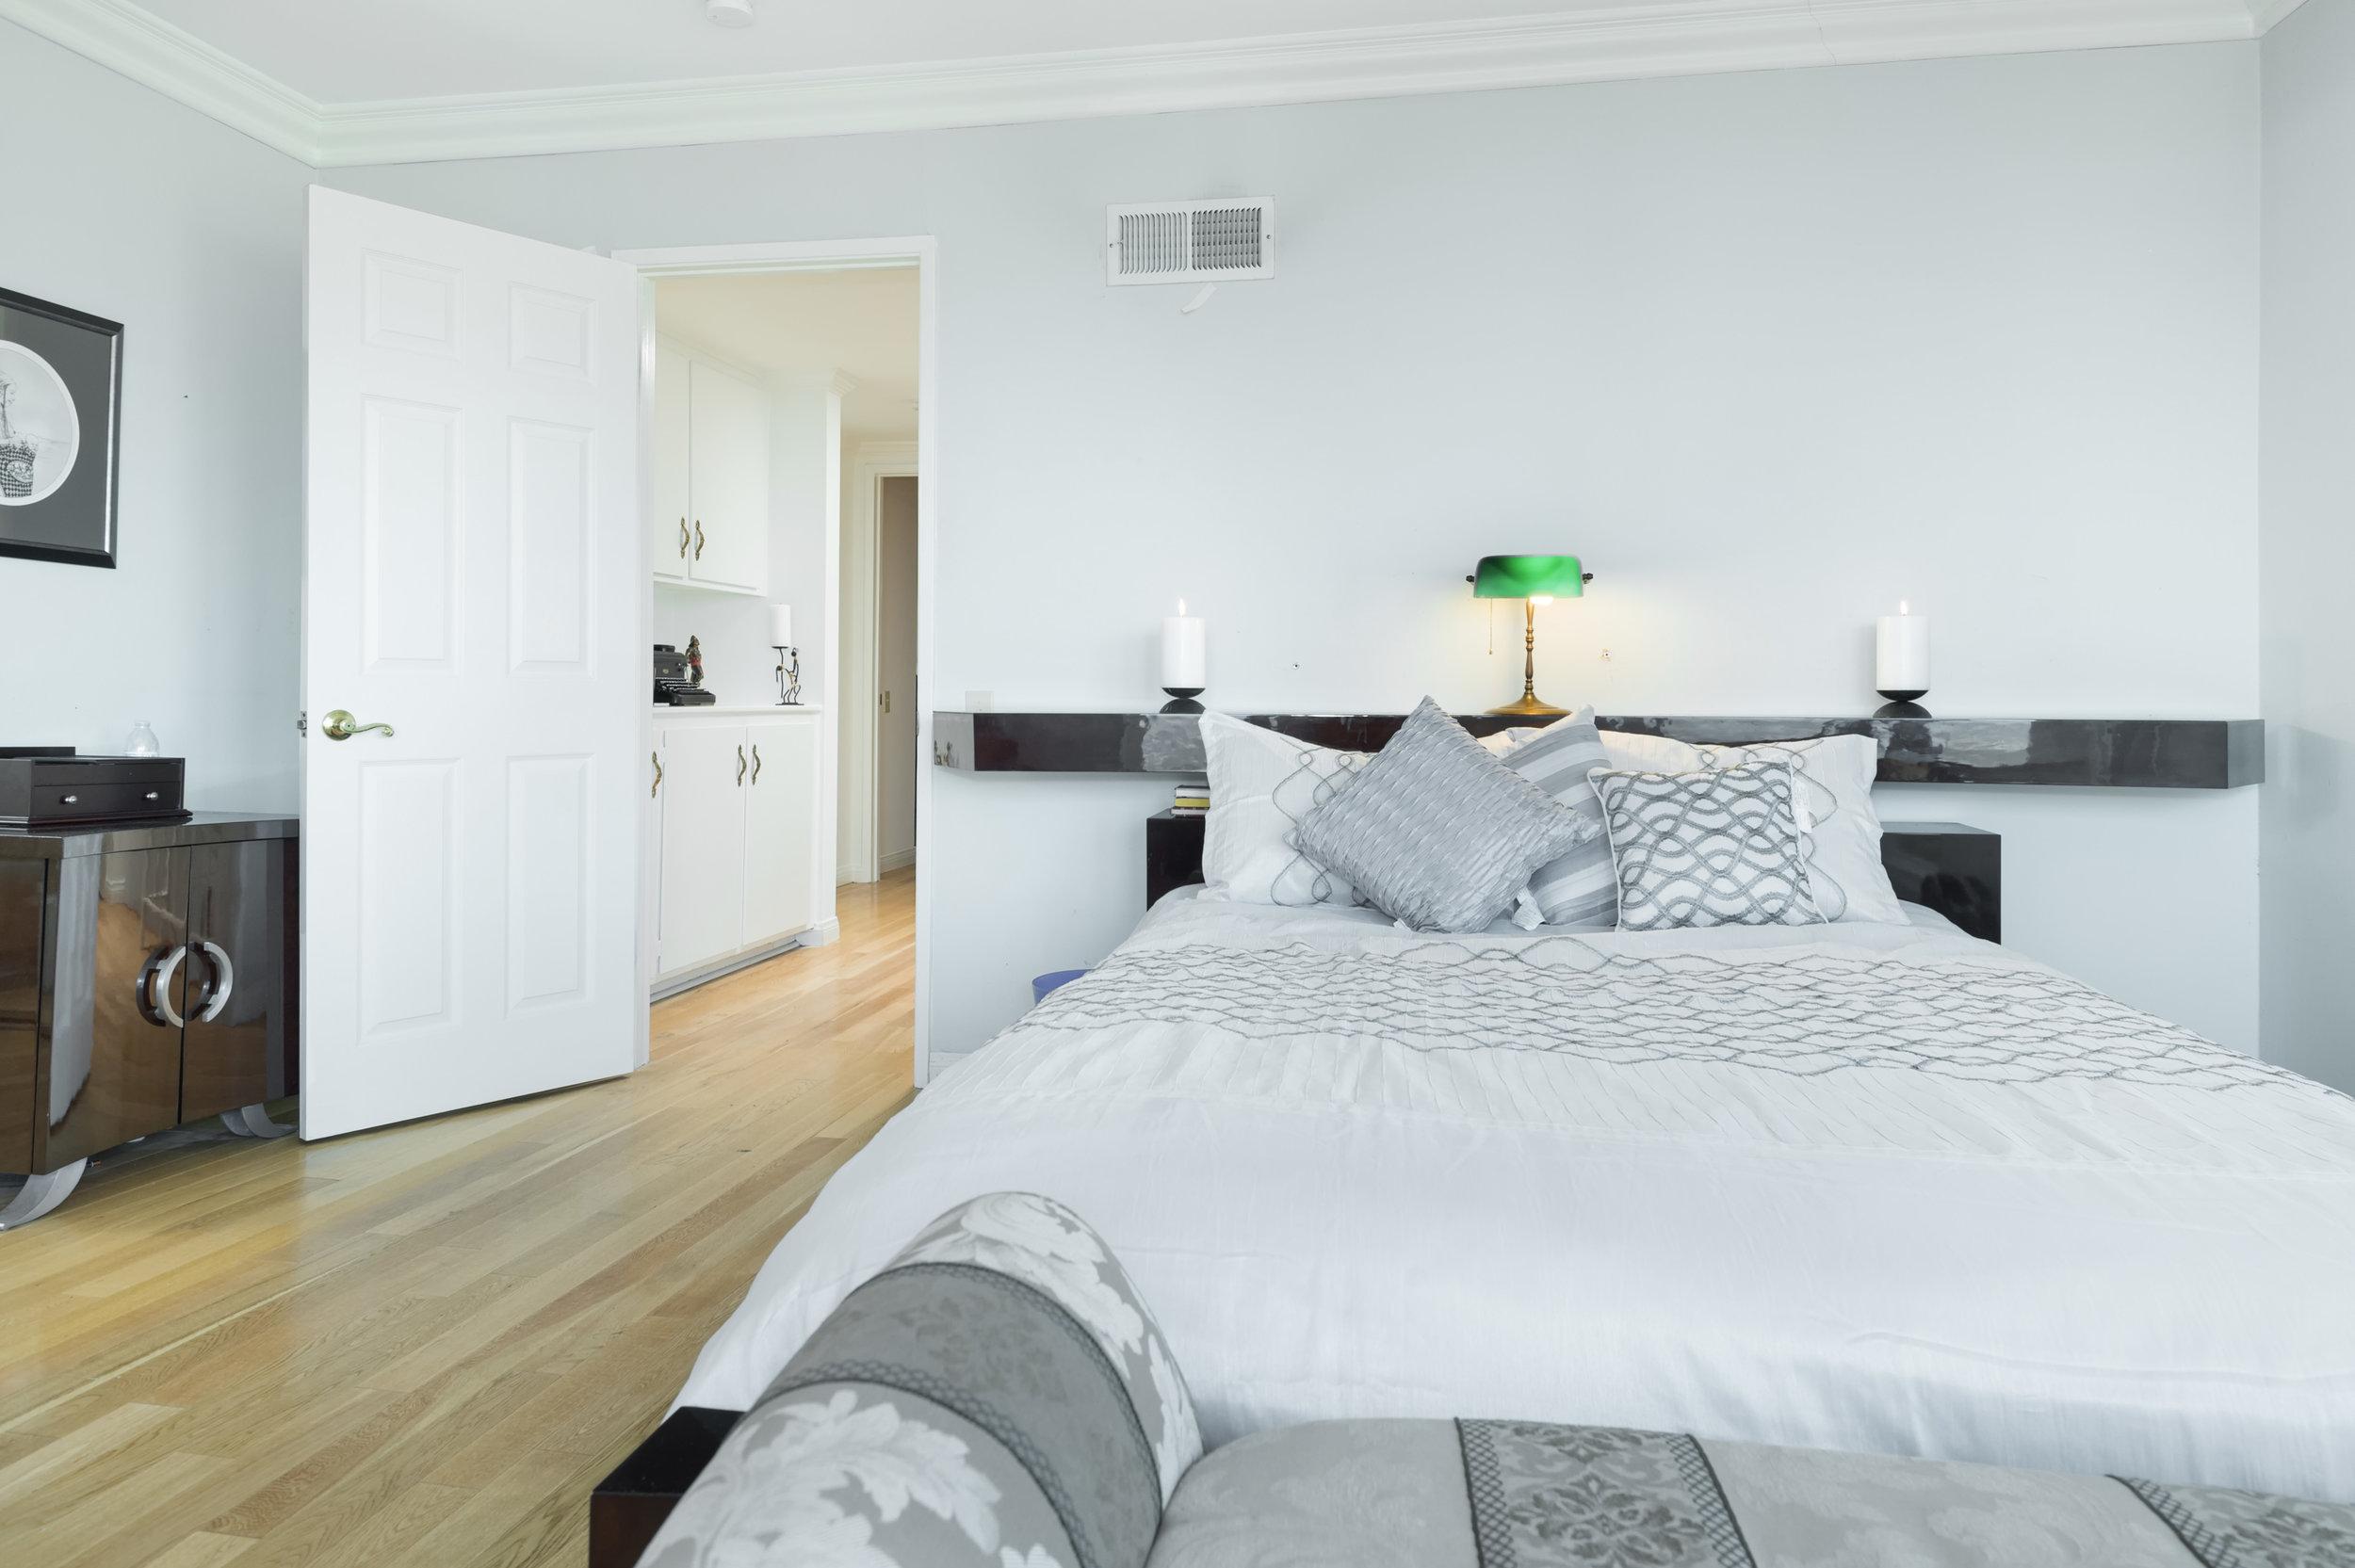 016 Bedroom 15072 Rayneta Sherman Oaks For Sale The Malibu Life Team Luxury Real Estate.jpg